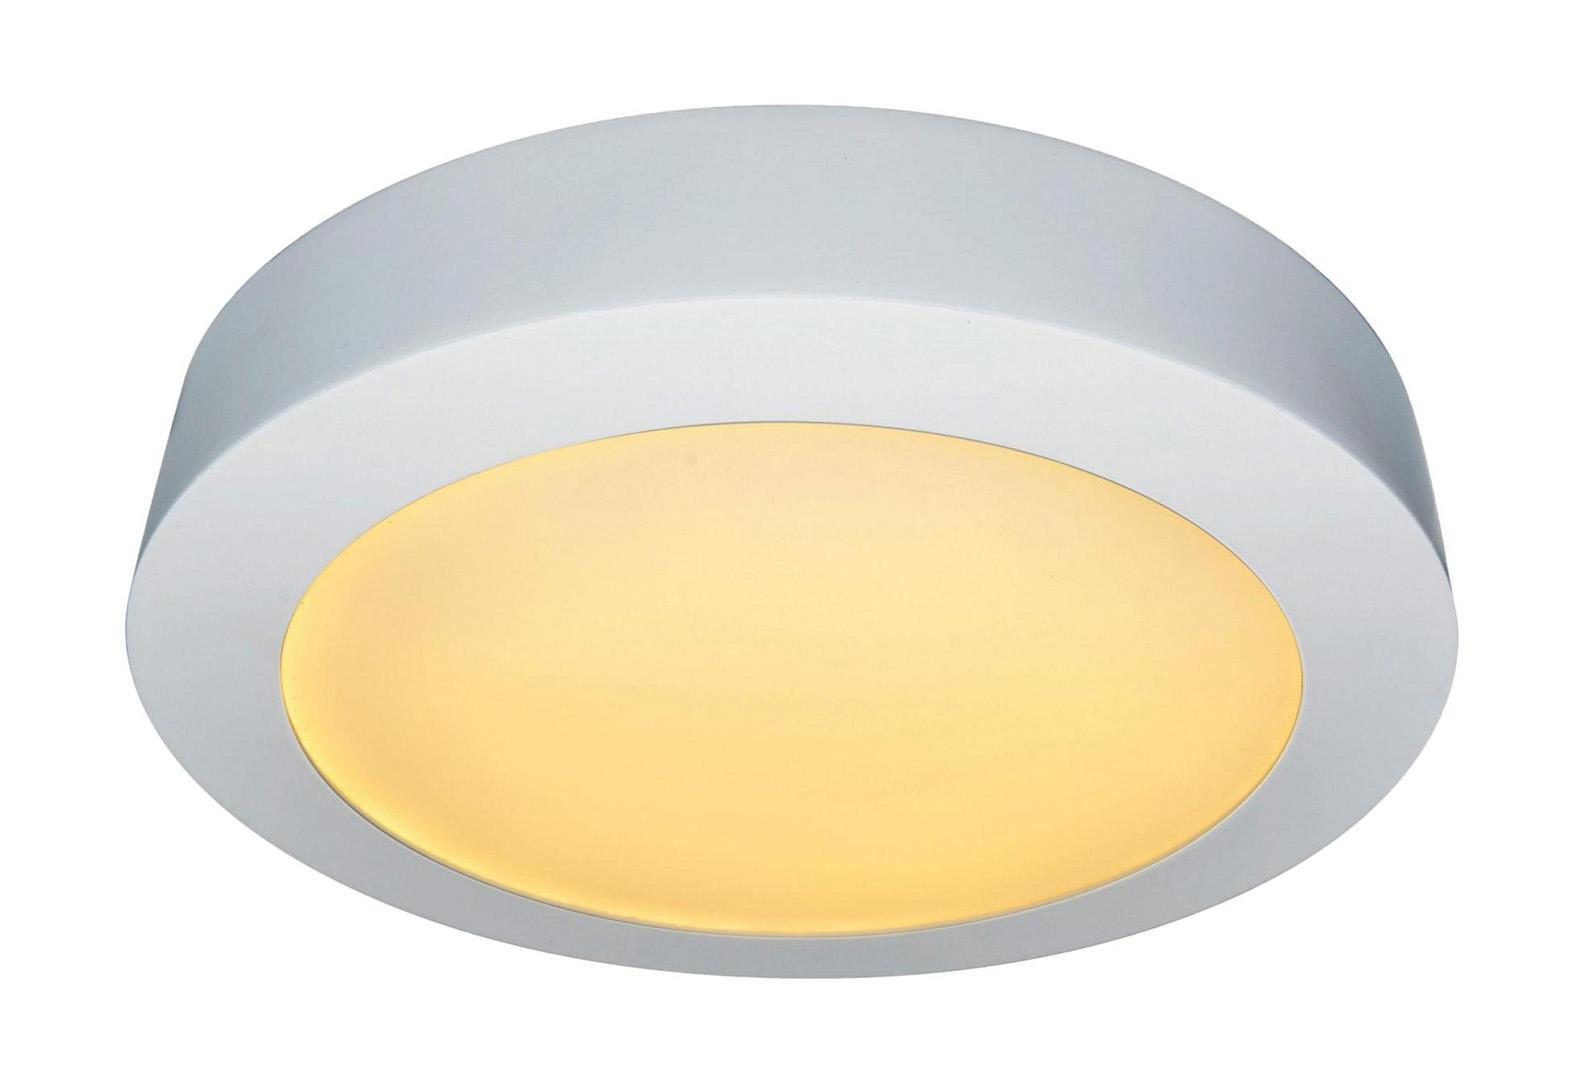 A3018PL-1WH ANGOLO Встраиваемый светильникA3018PL-1WH18W LED; 1440 lm Материал: Арматура: Алюминий / Элемент декора: Пластик Размер: 220x220x40 Цвет: Белый